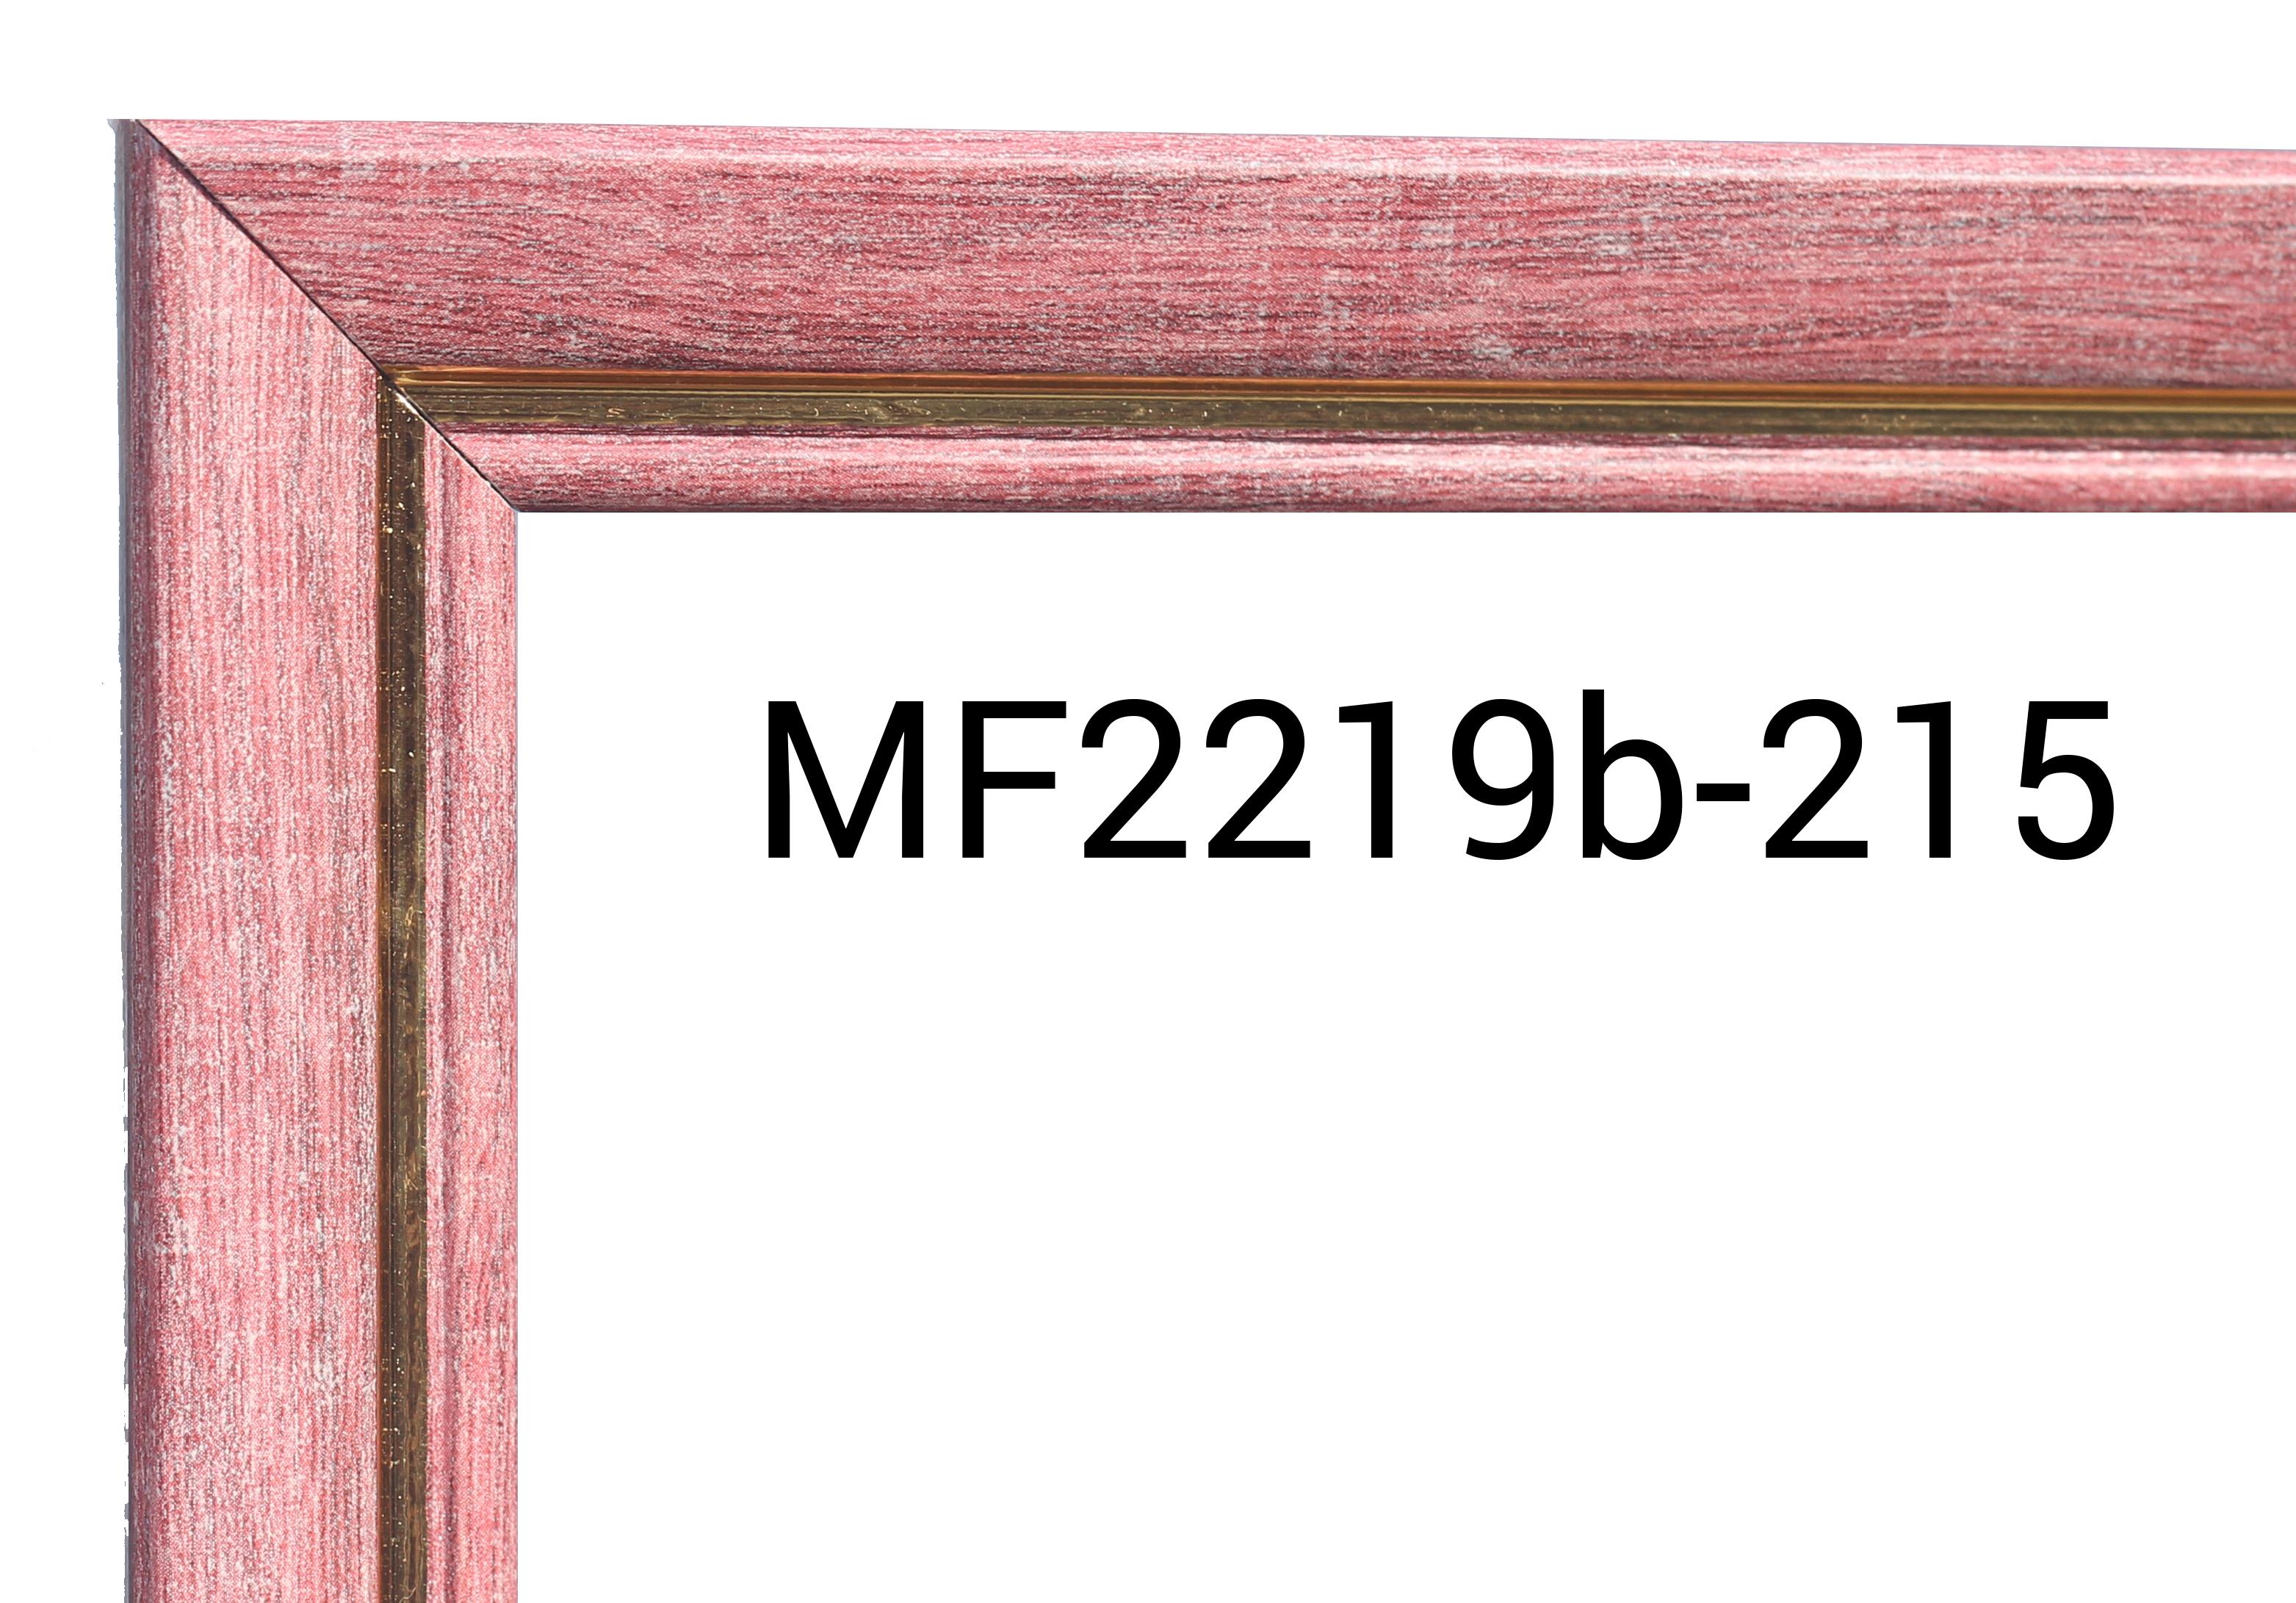 2219b-215